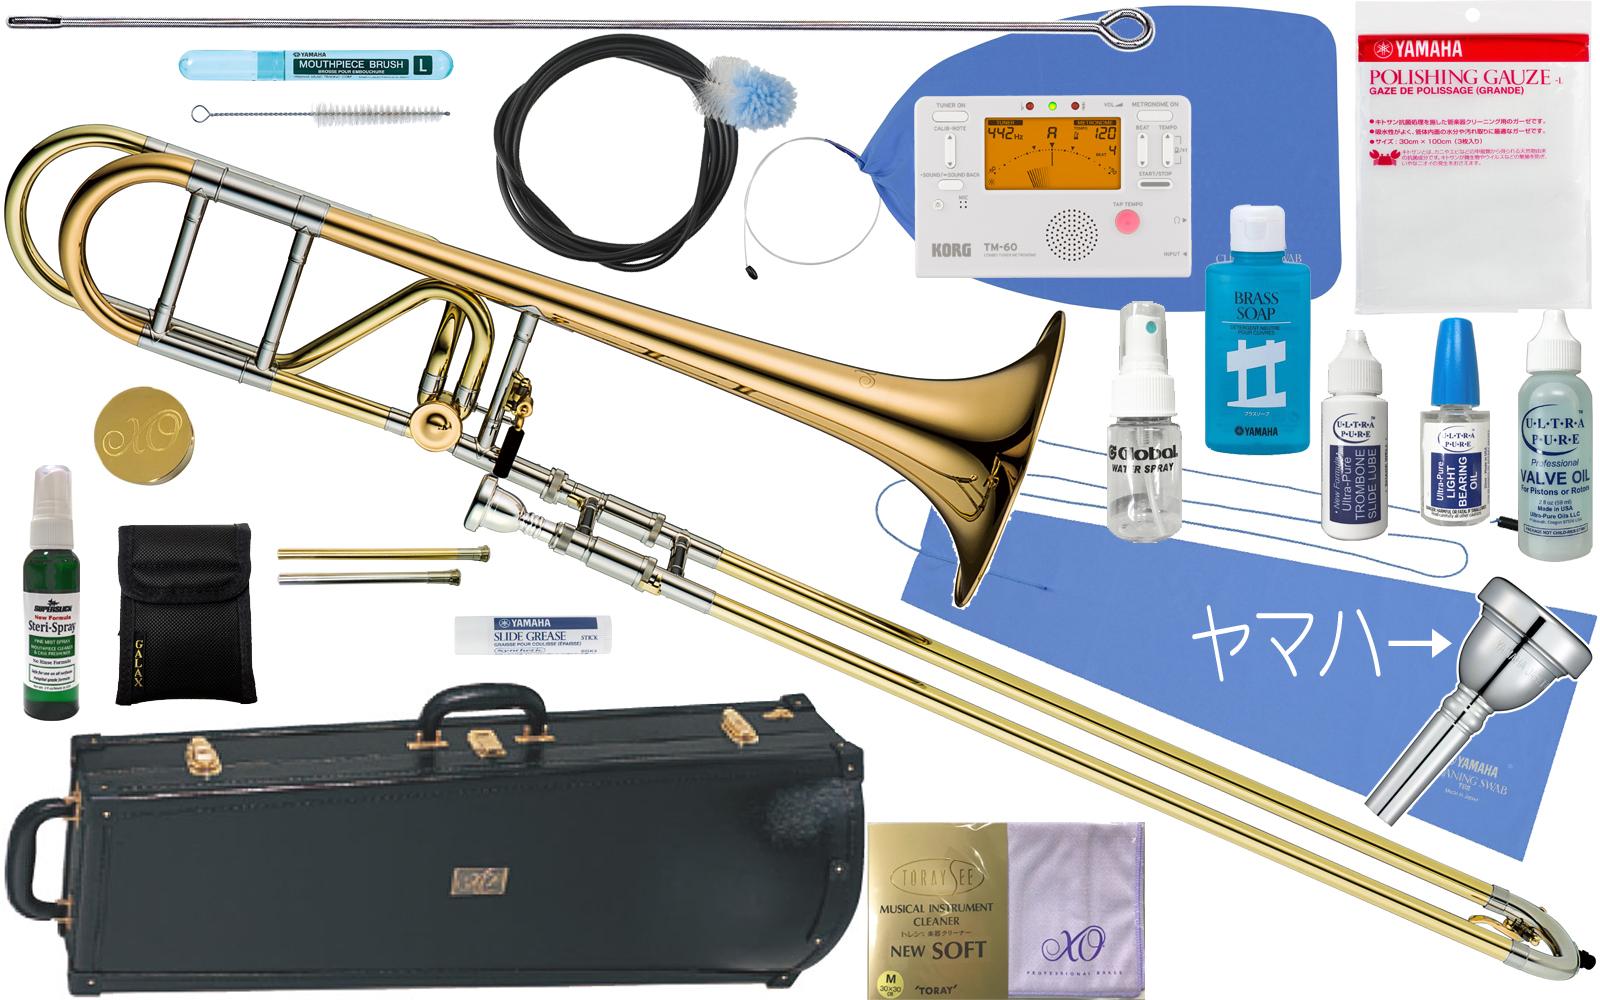 XO ( エックスオー ) 1236RL-O トロンボーン 正規品 B♭ F管 テナーバストロンボーン オープンラップ 太管 Tenor Bass Trombones UT-GB セット A 北海道 沖縄 離島不可